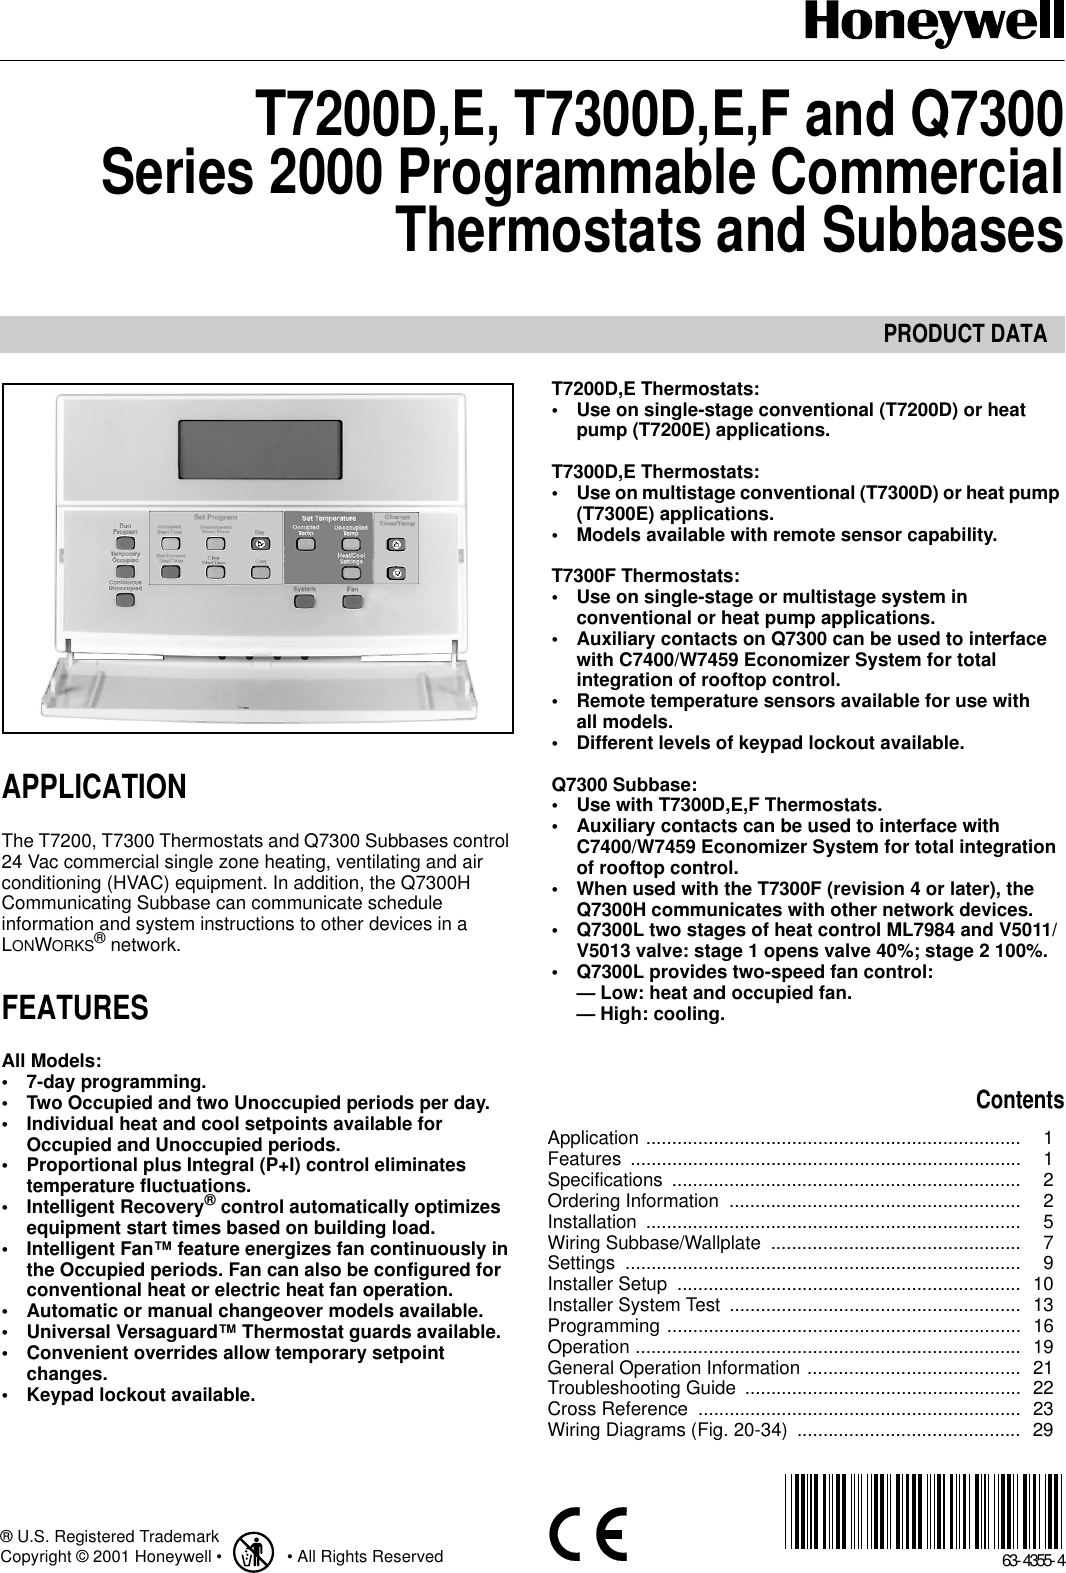 Honeywell Series 2000 T7300d Users Manual T7200d E  T7300d